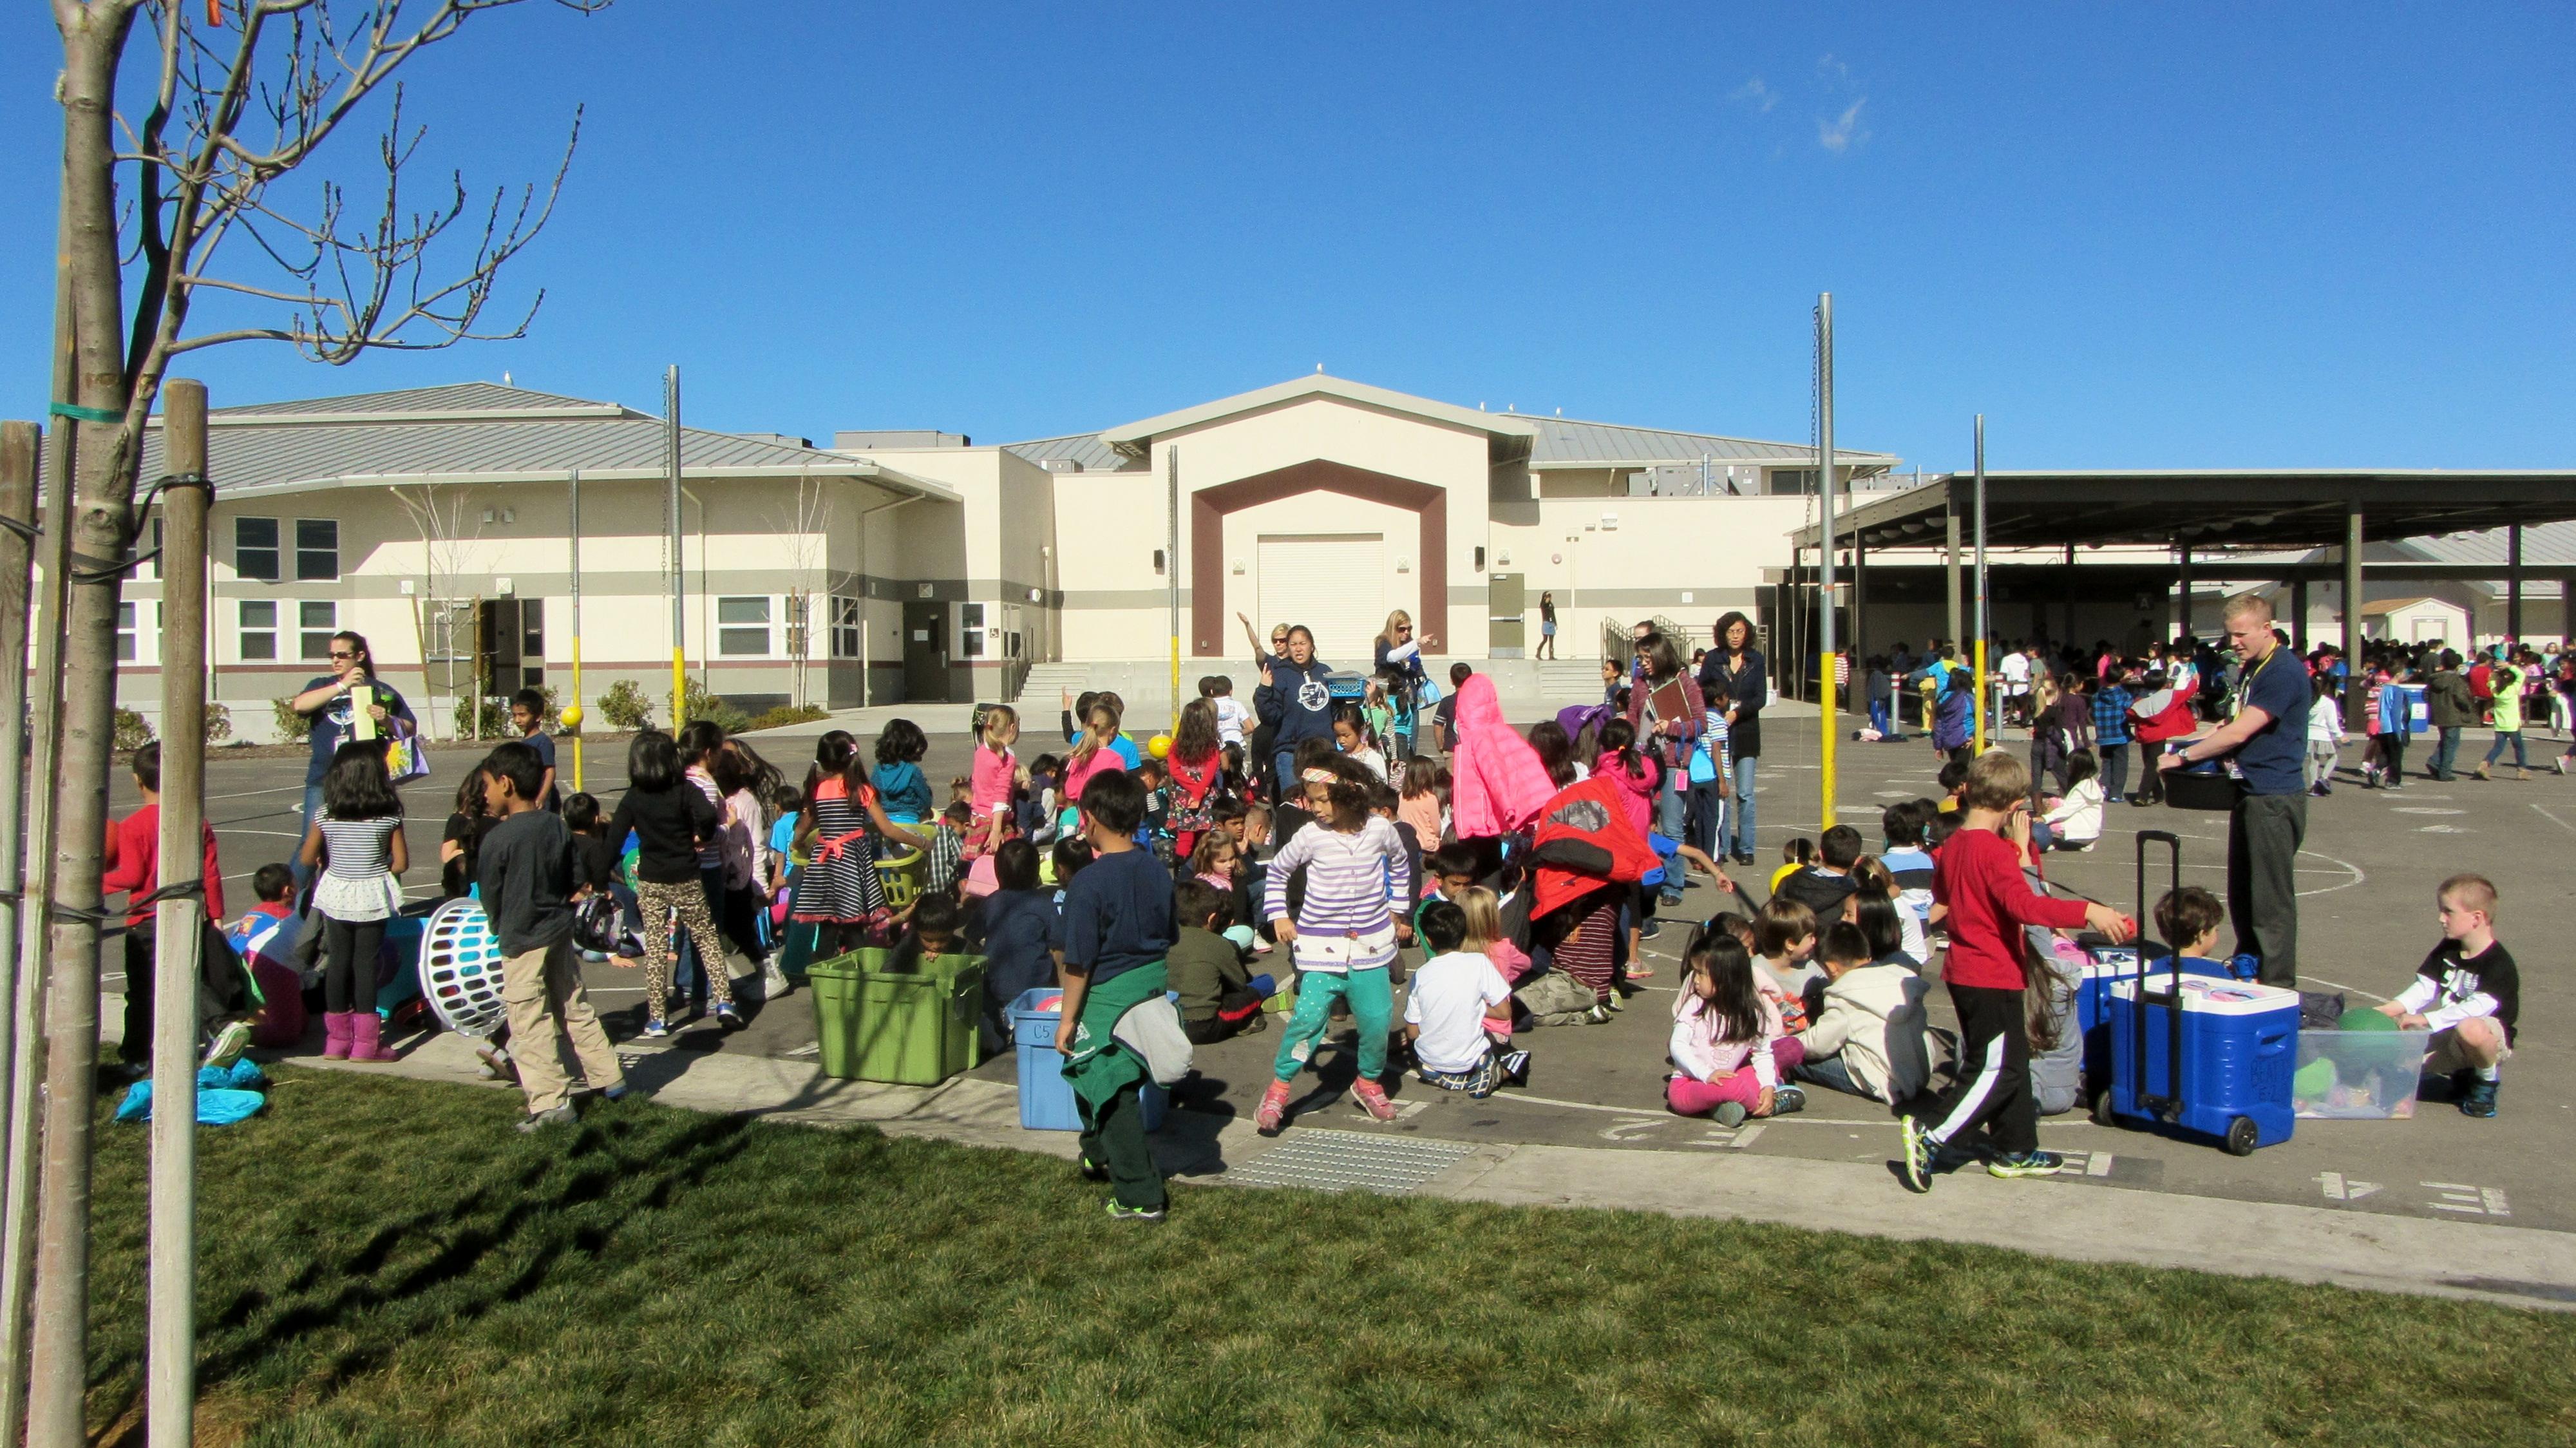 kolb elementary school in the spotlight at dusd board of